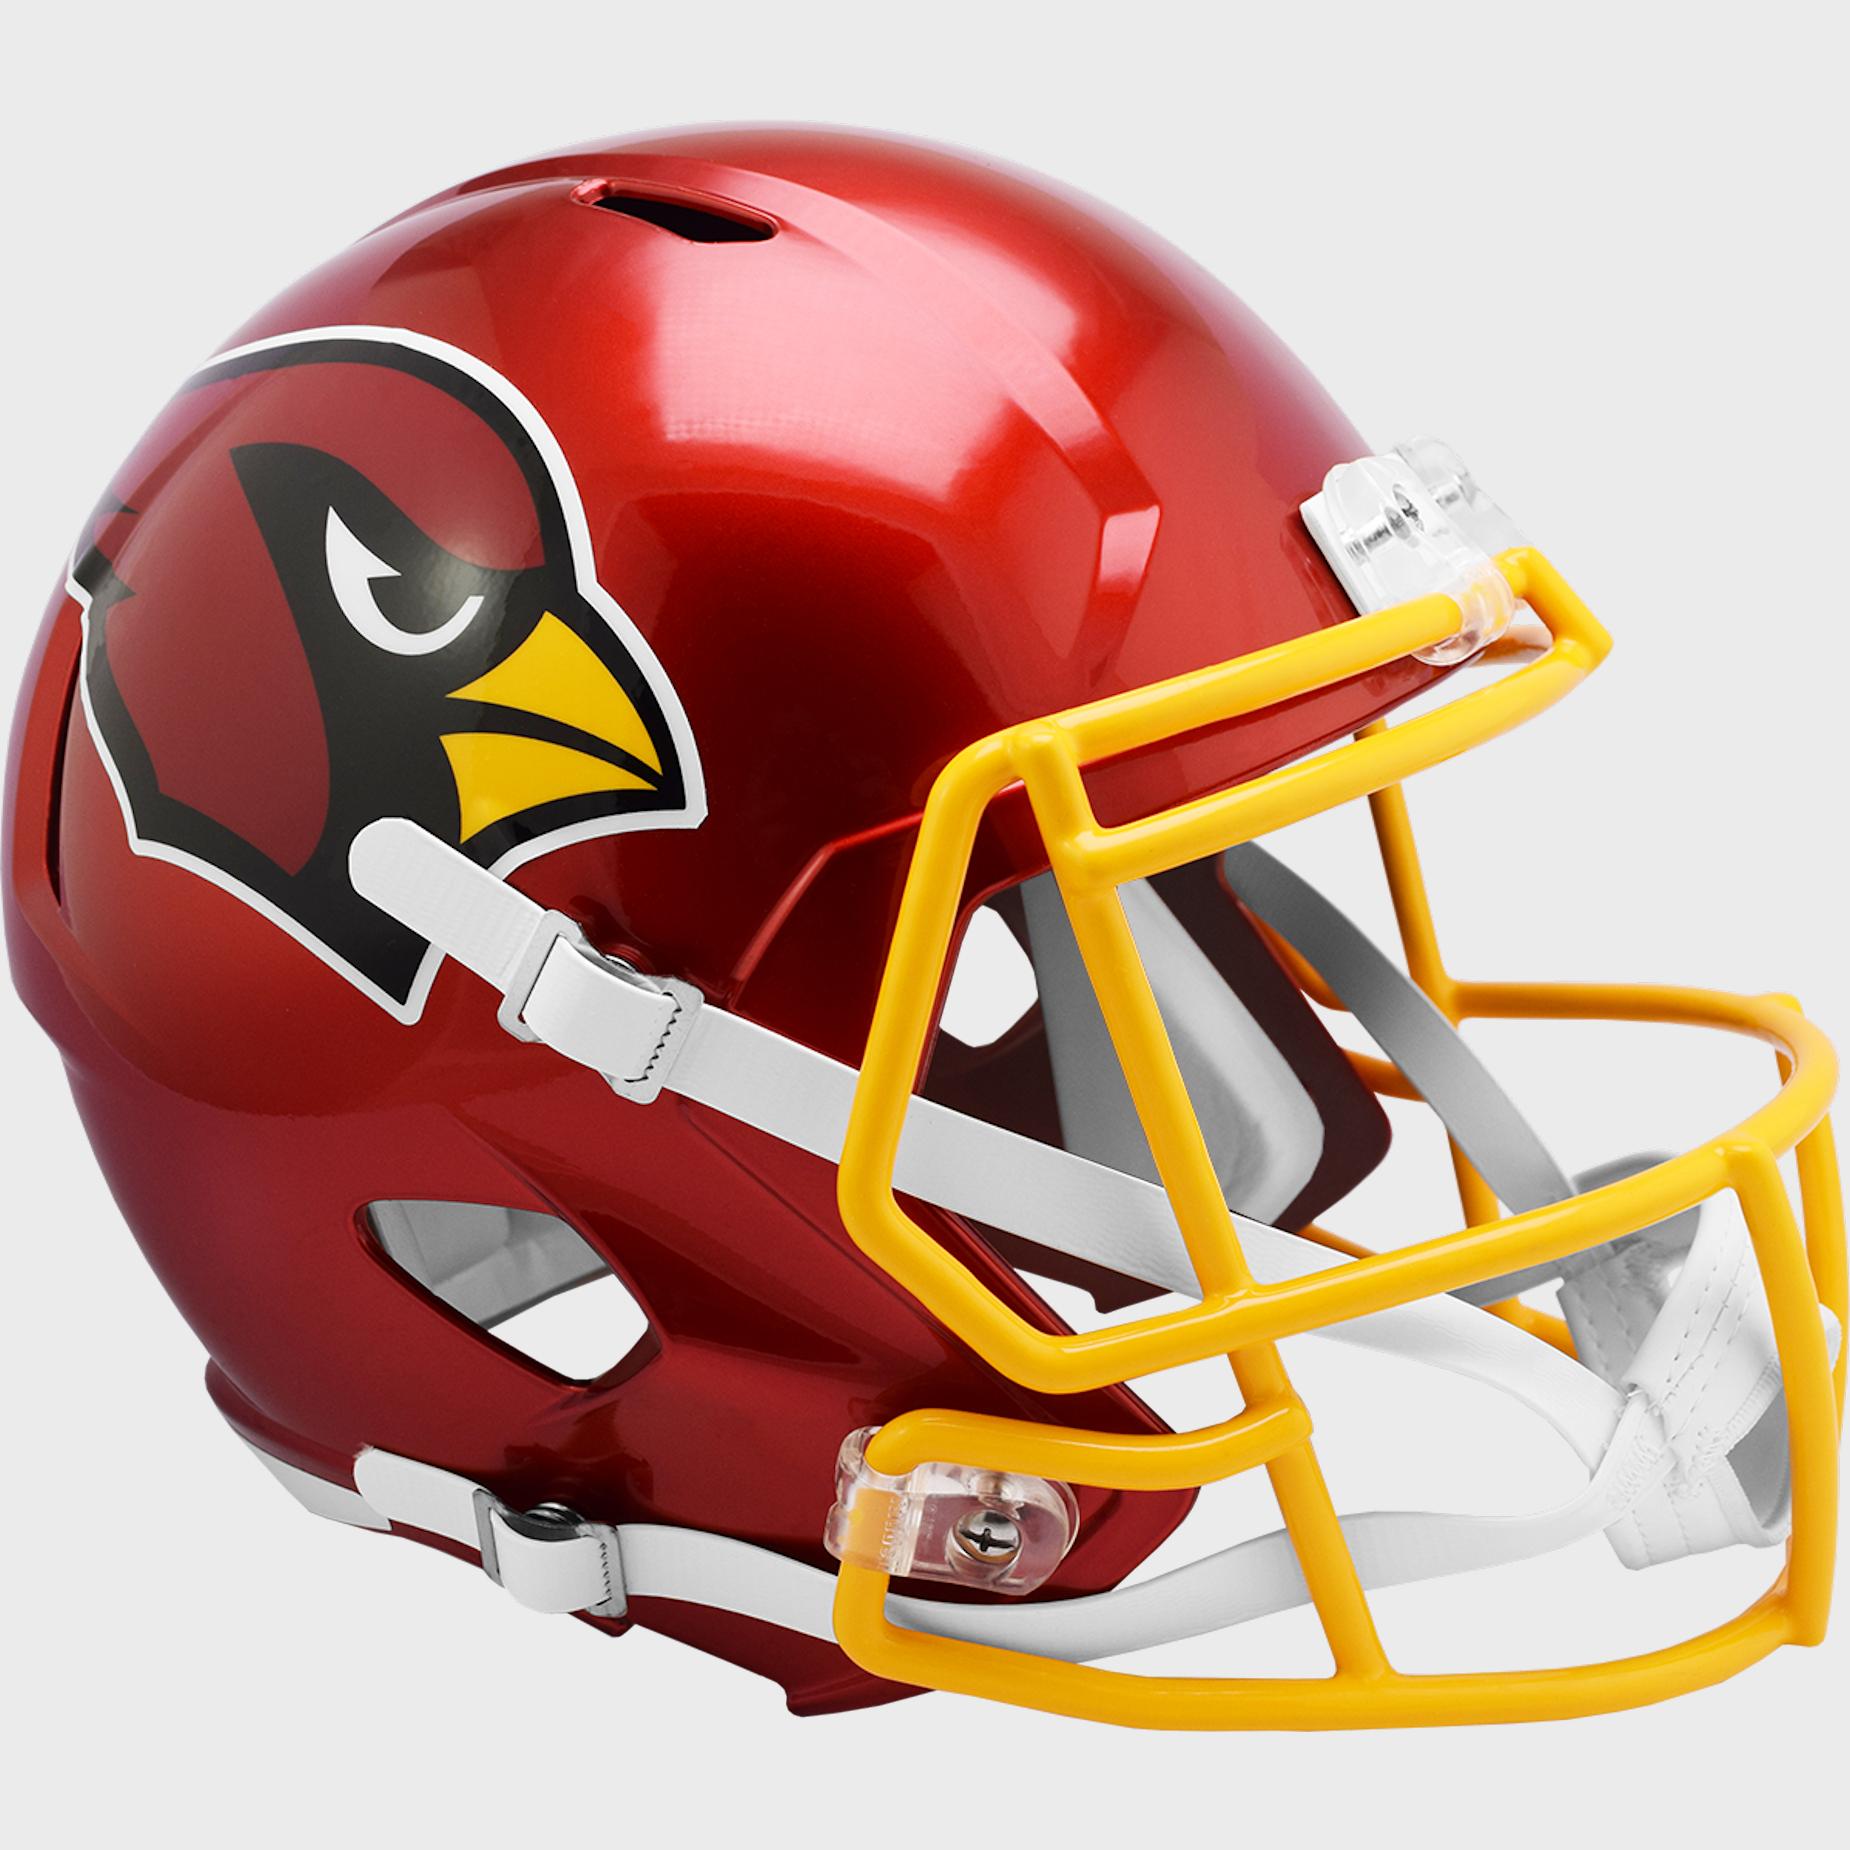 Arizona Cardinals Speed Replica Football Helmet <B>FLASH ESD 8/21/21</B>